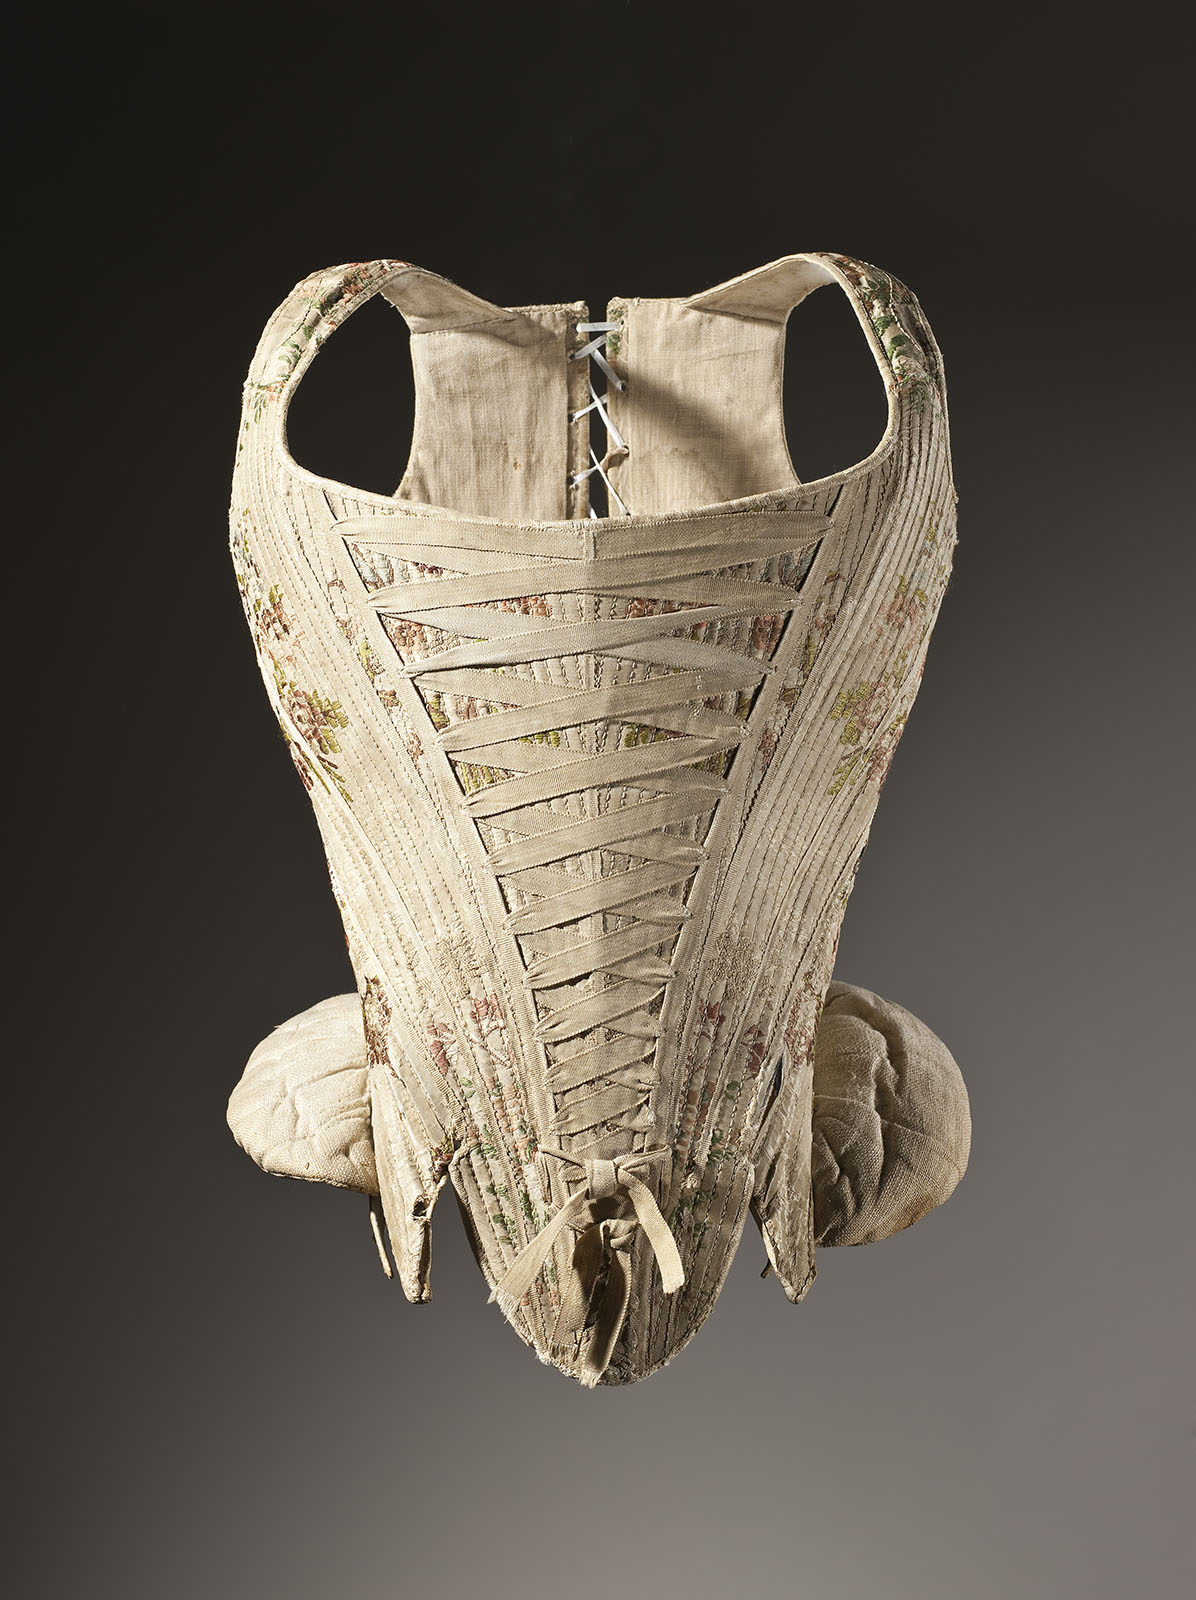 Woman's_corset_figured_silk_1730-1740